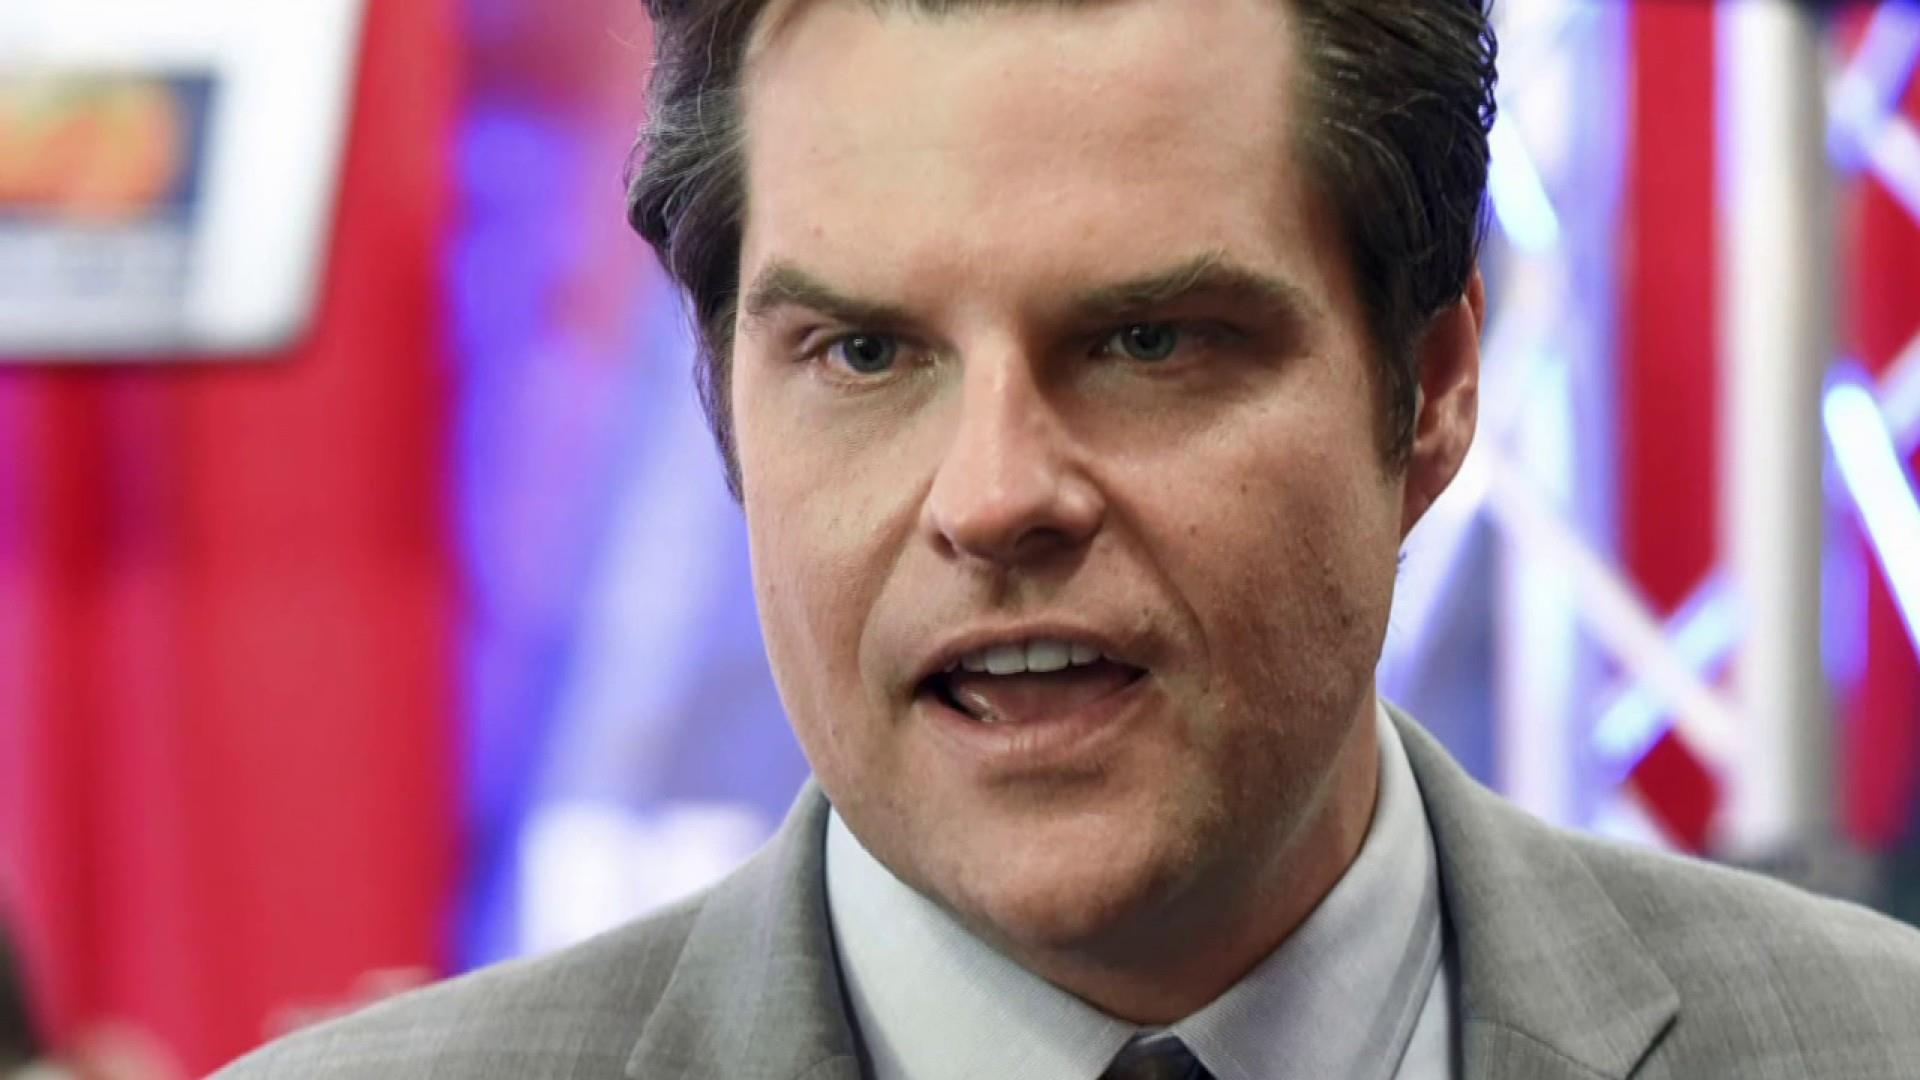 Feds Charge FL Developer In Alleged Gaetz Extortion Plot